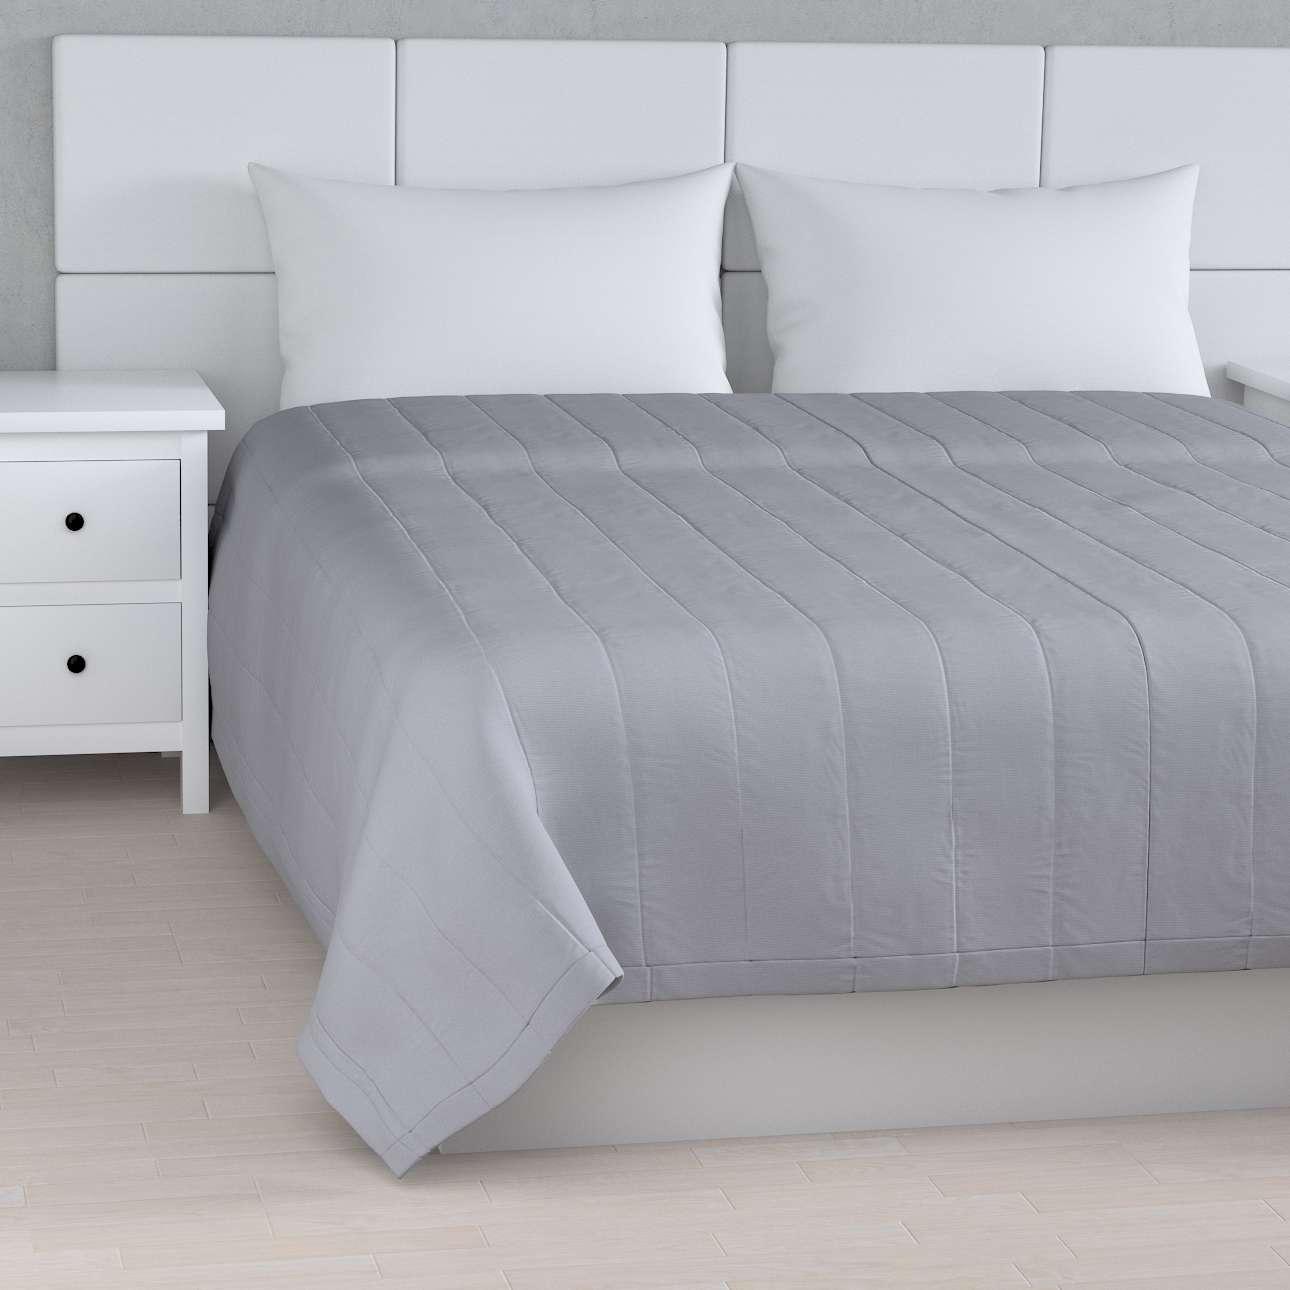 Prehoz na posteľ jednoduchý V kolekcii Jupiter, tkanina: 127-92